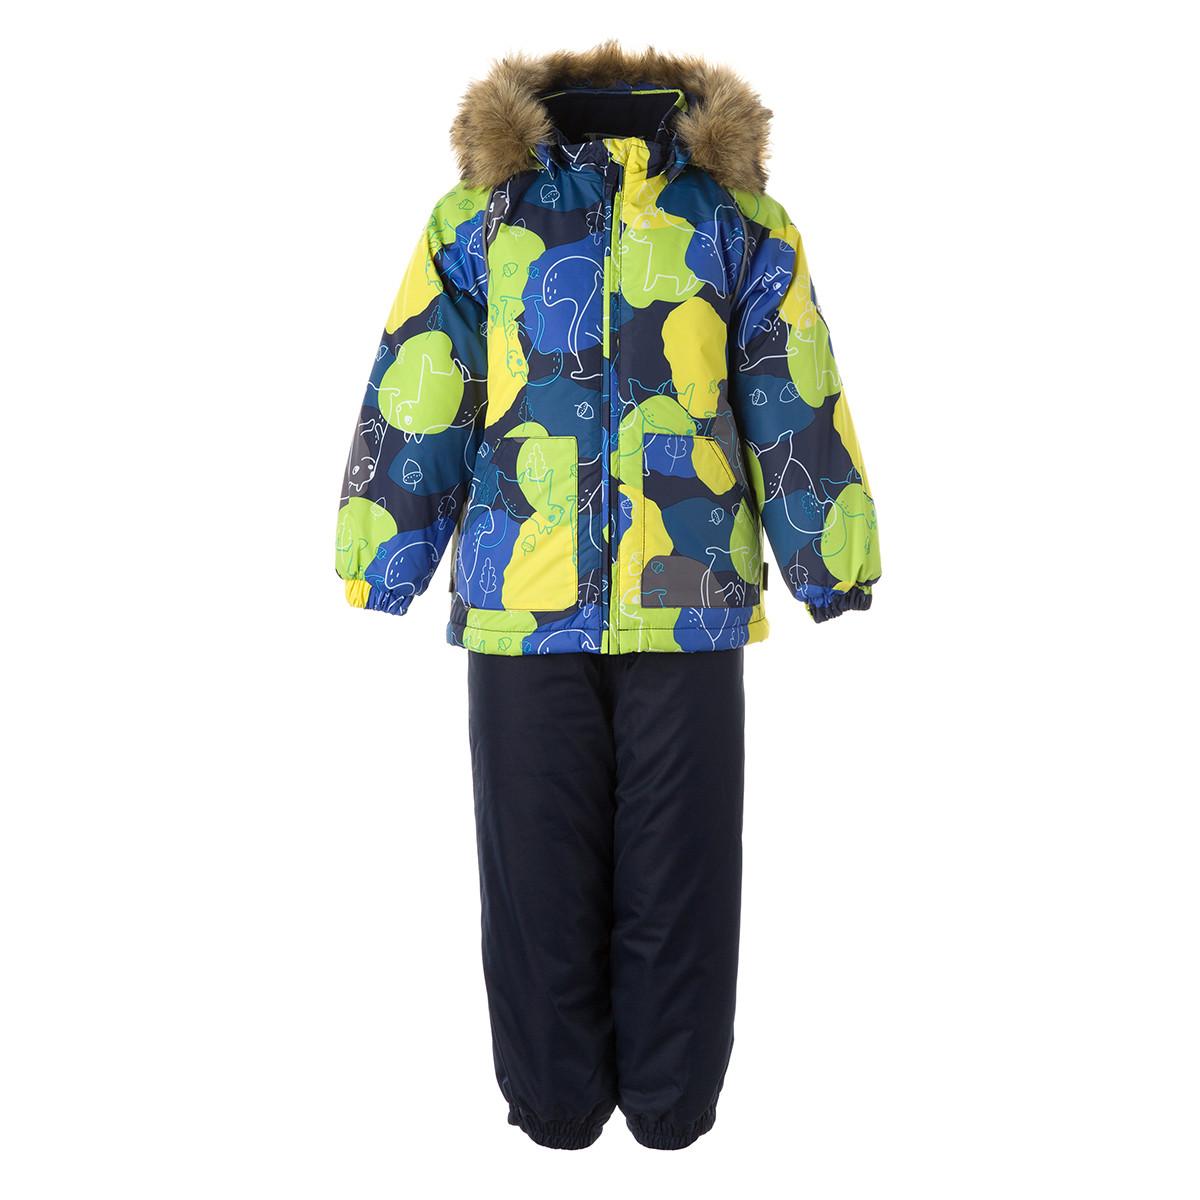 Детский комплект Huppa AVERY, темно-синий с принтом